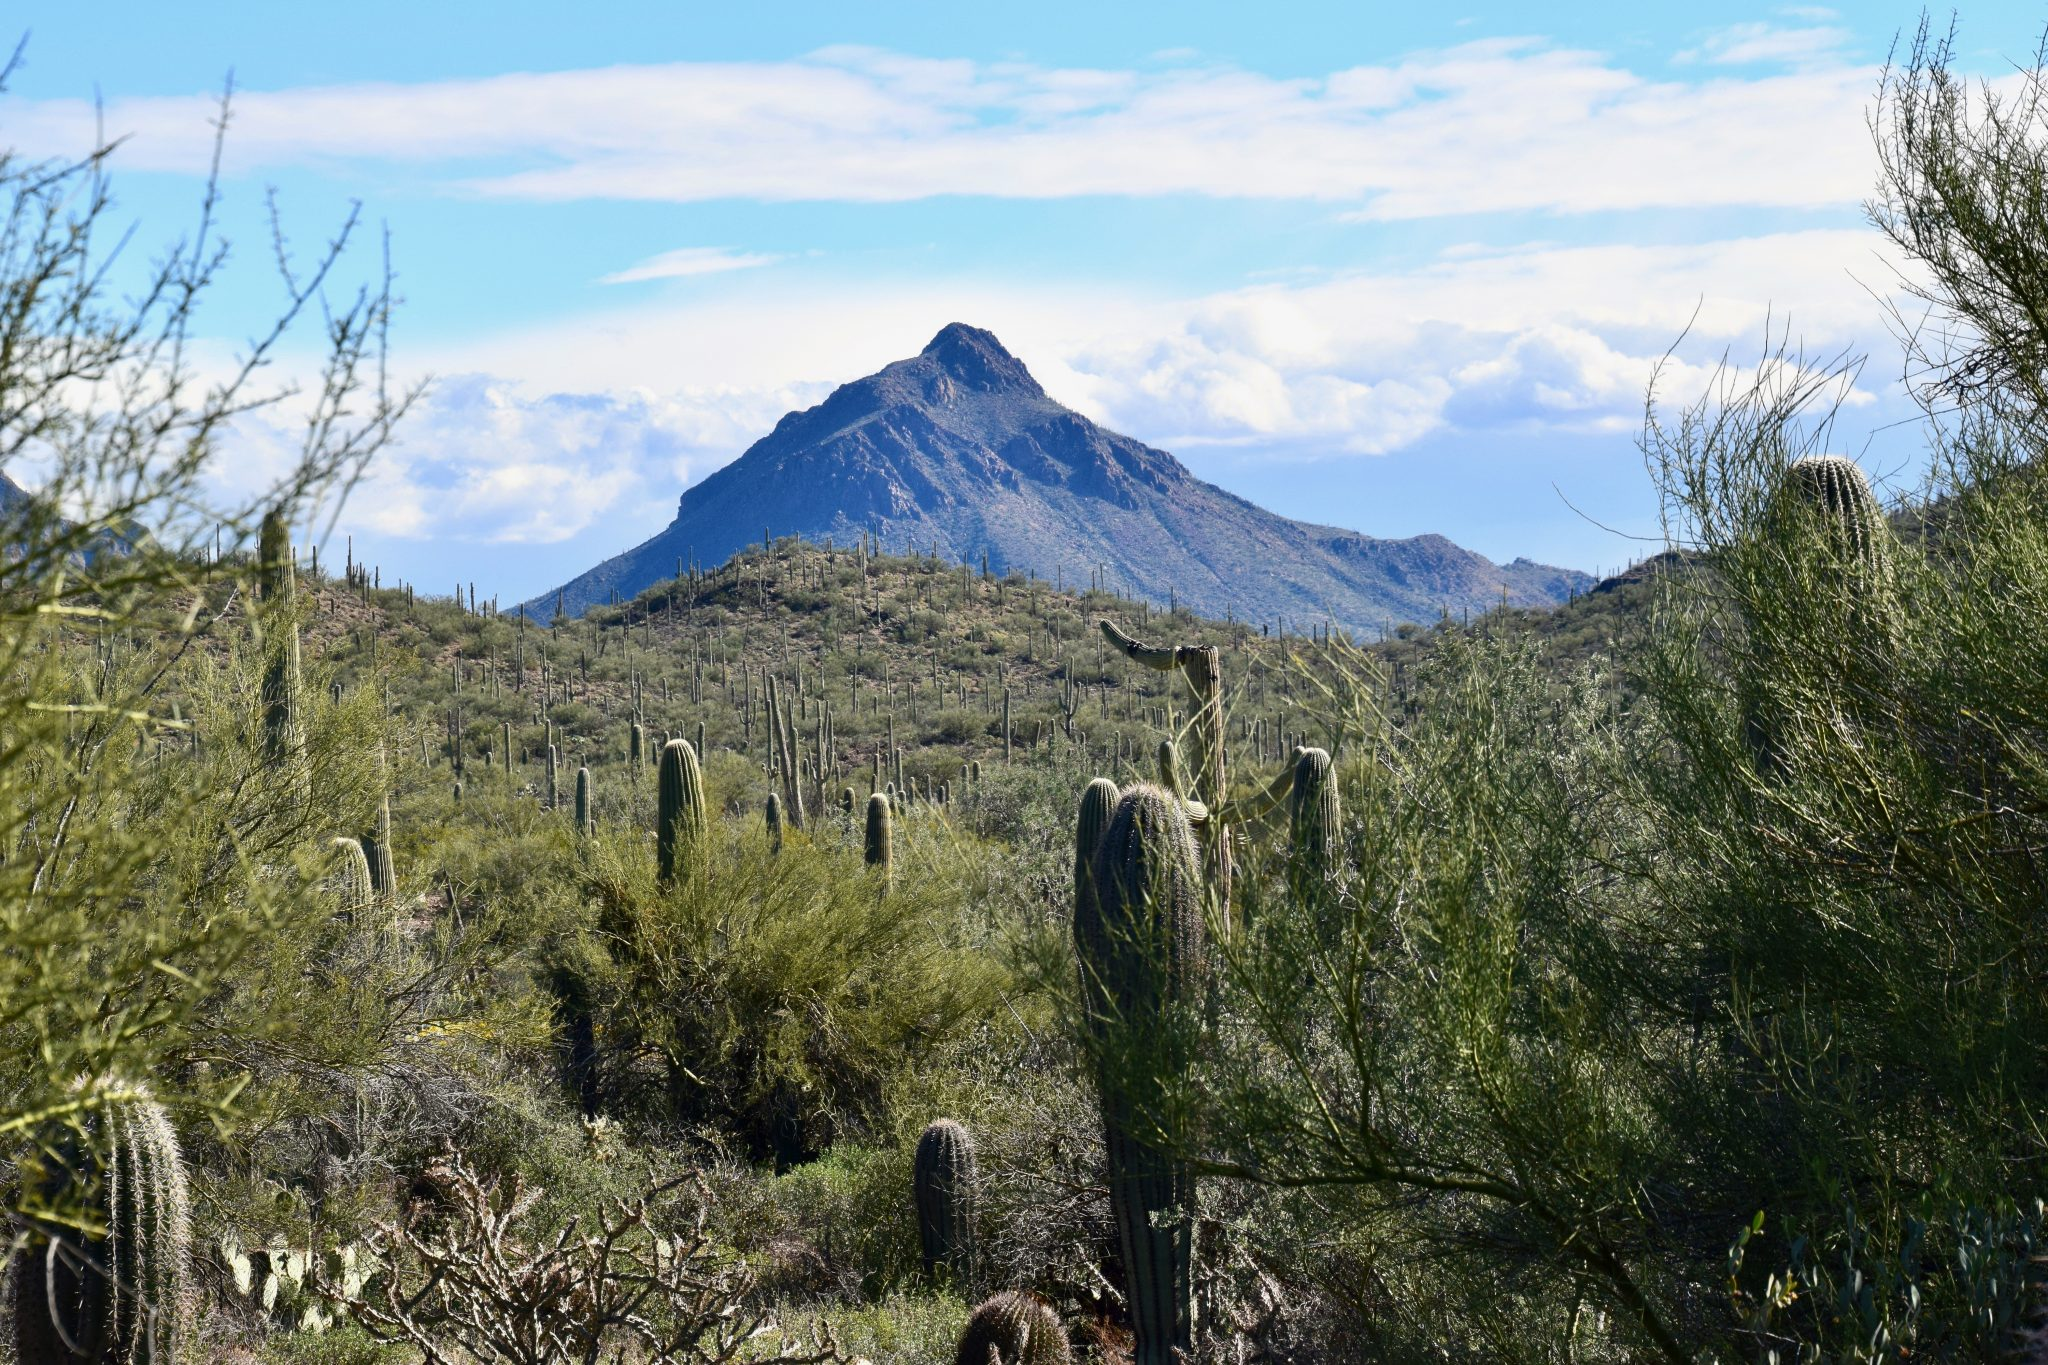 mountains and cactus in Tucson, Arizona